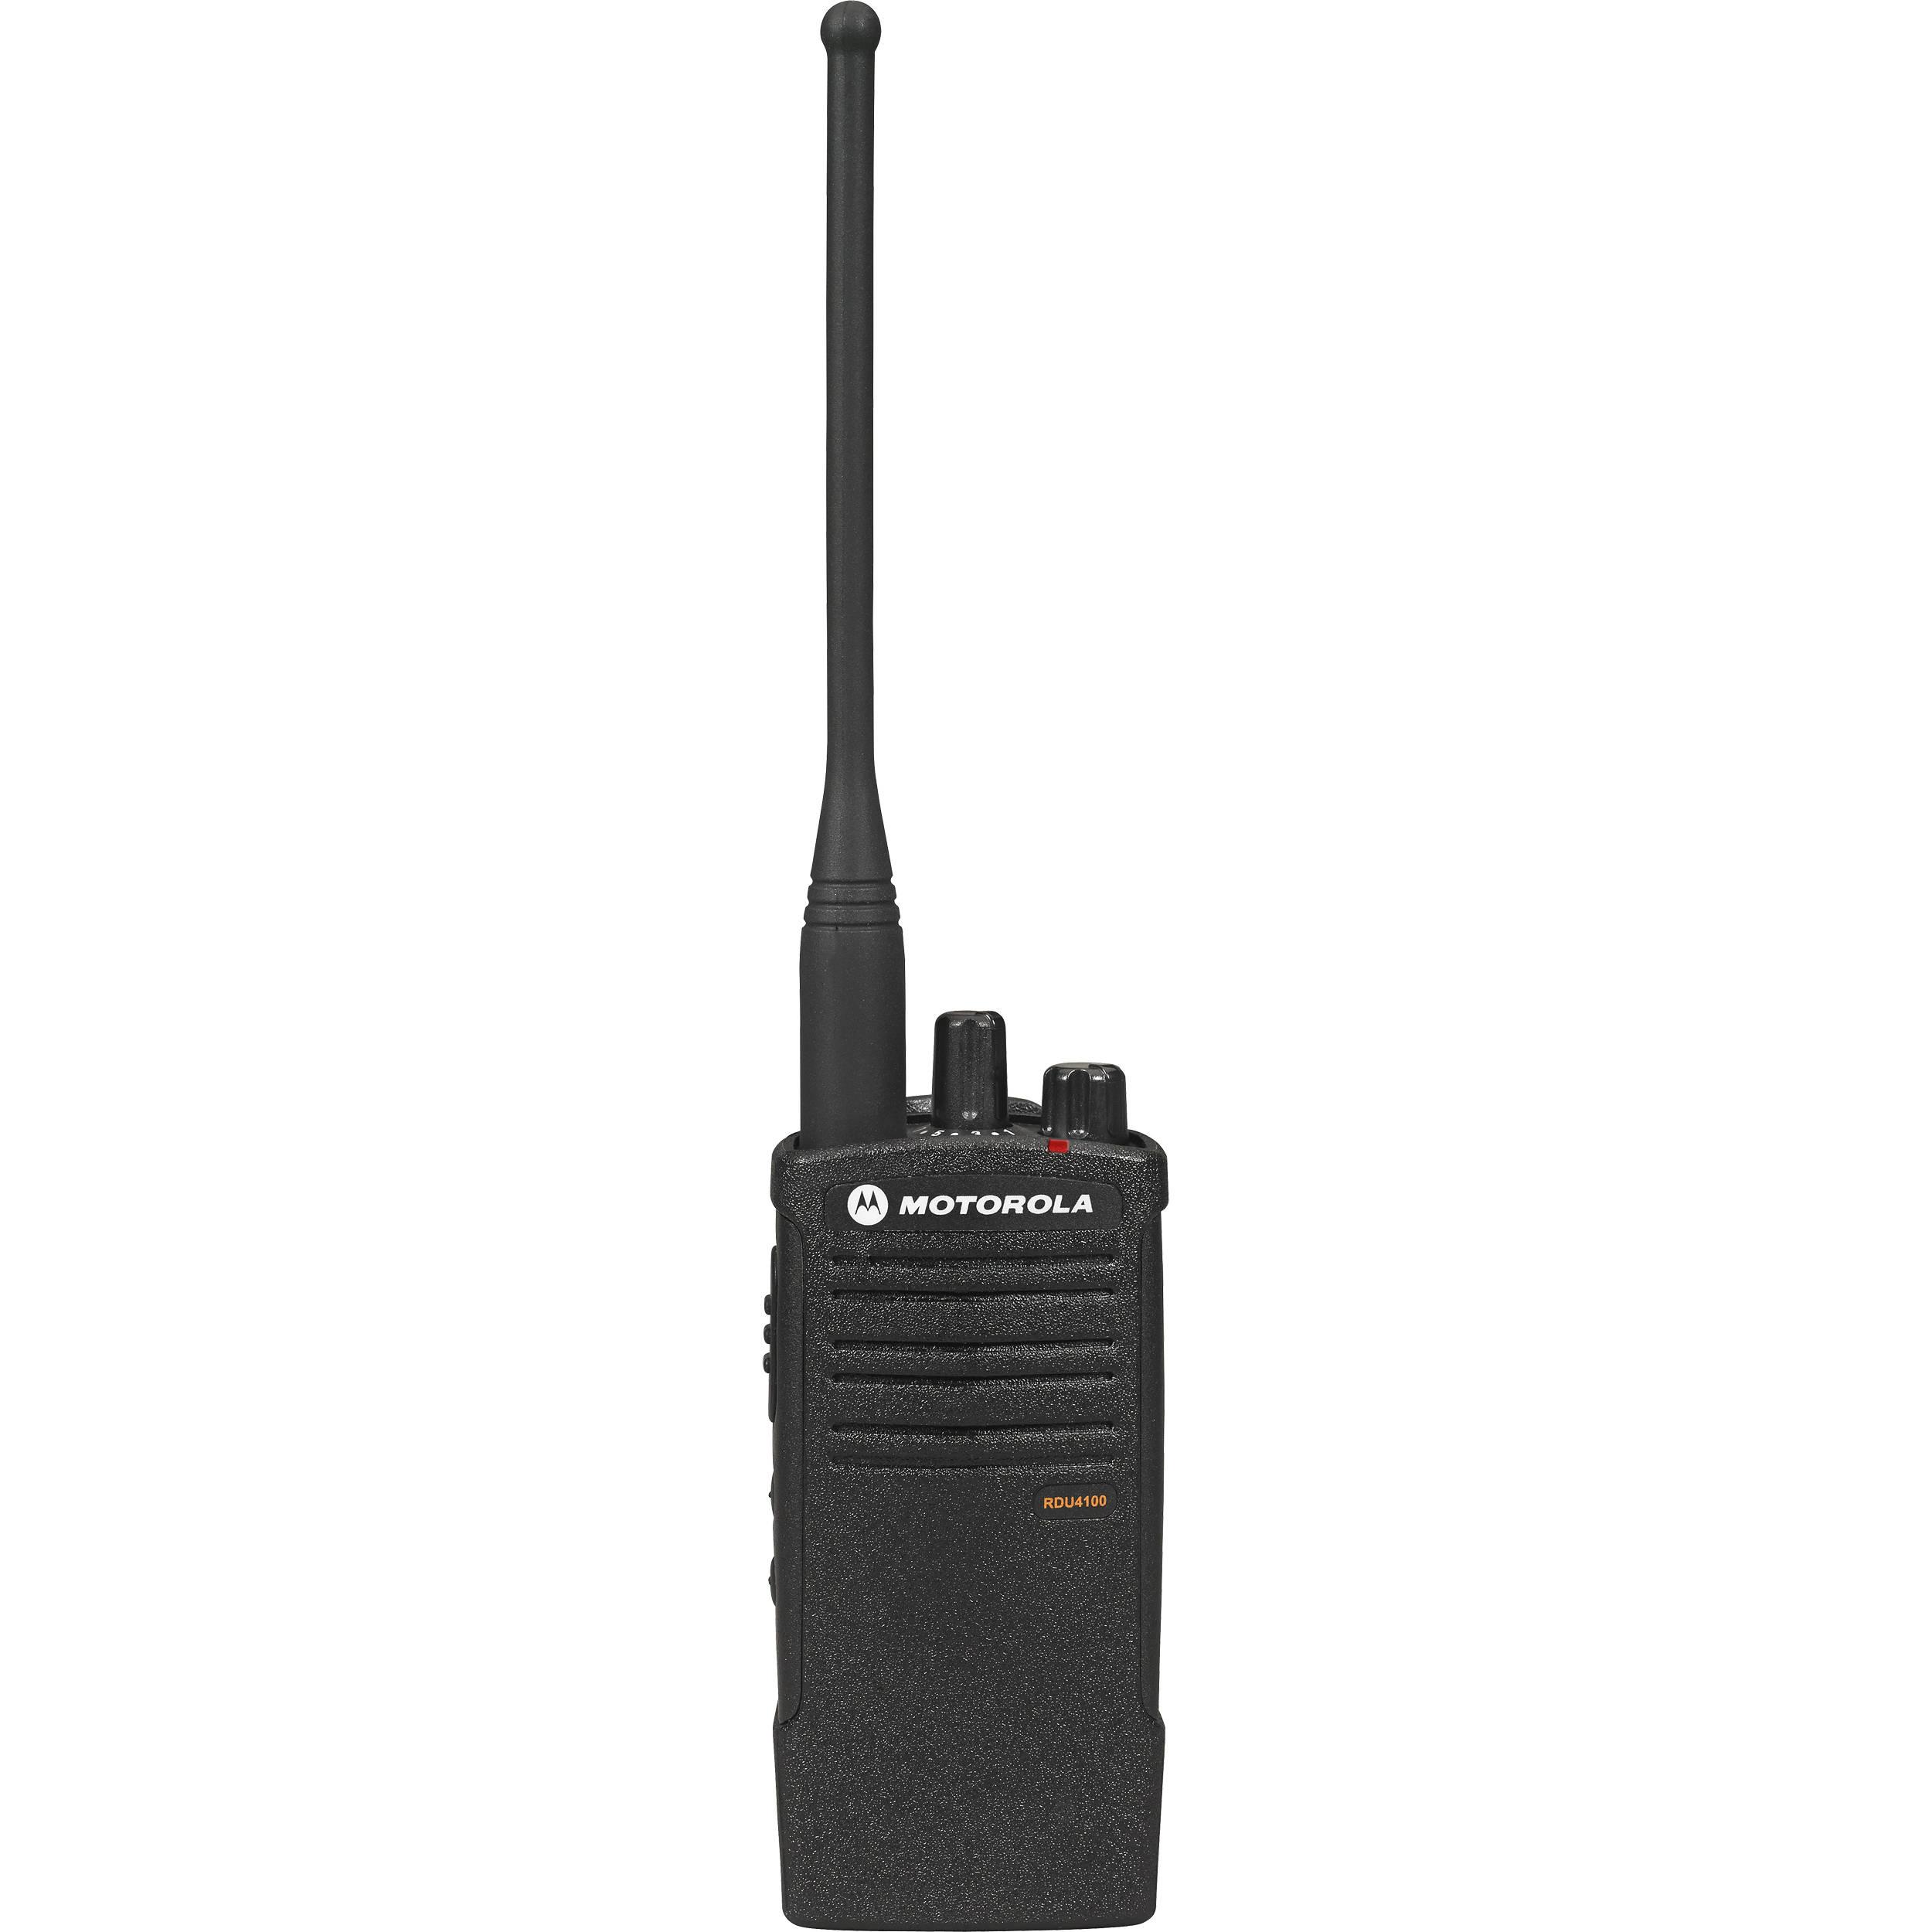 How to Use a UHF Radio